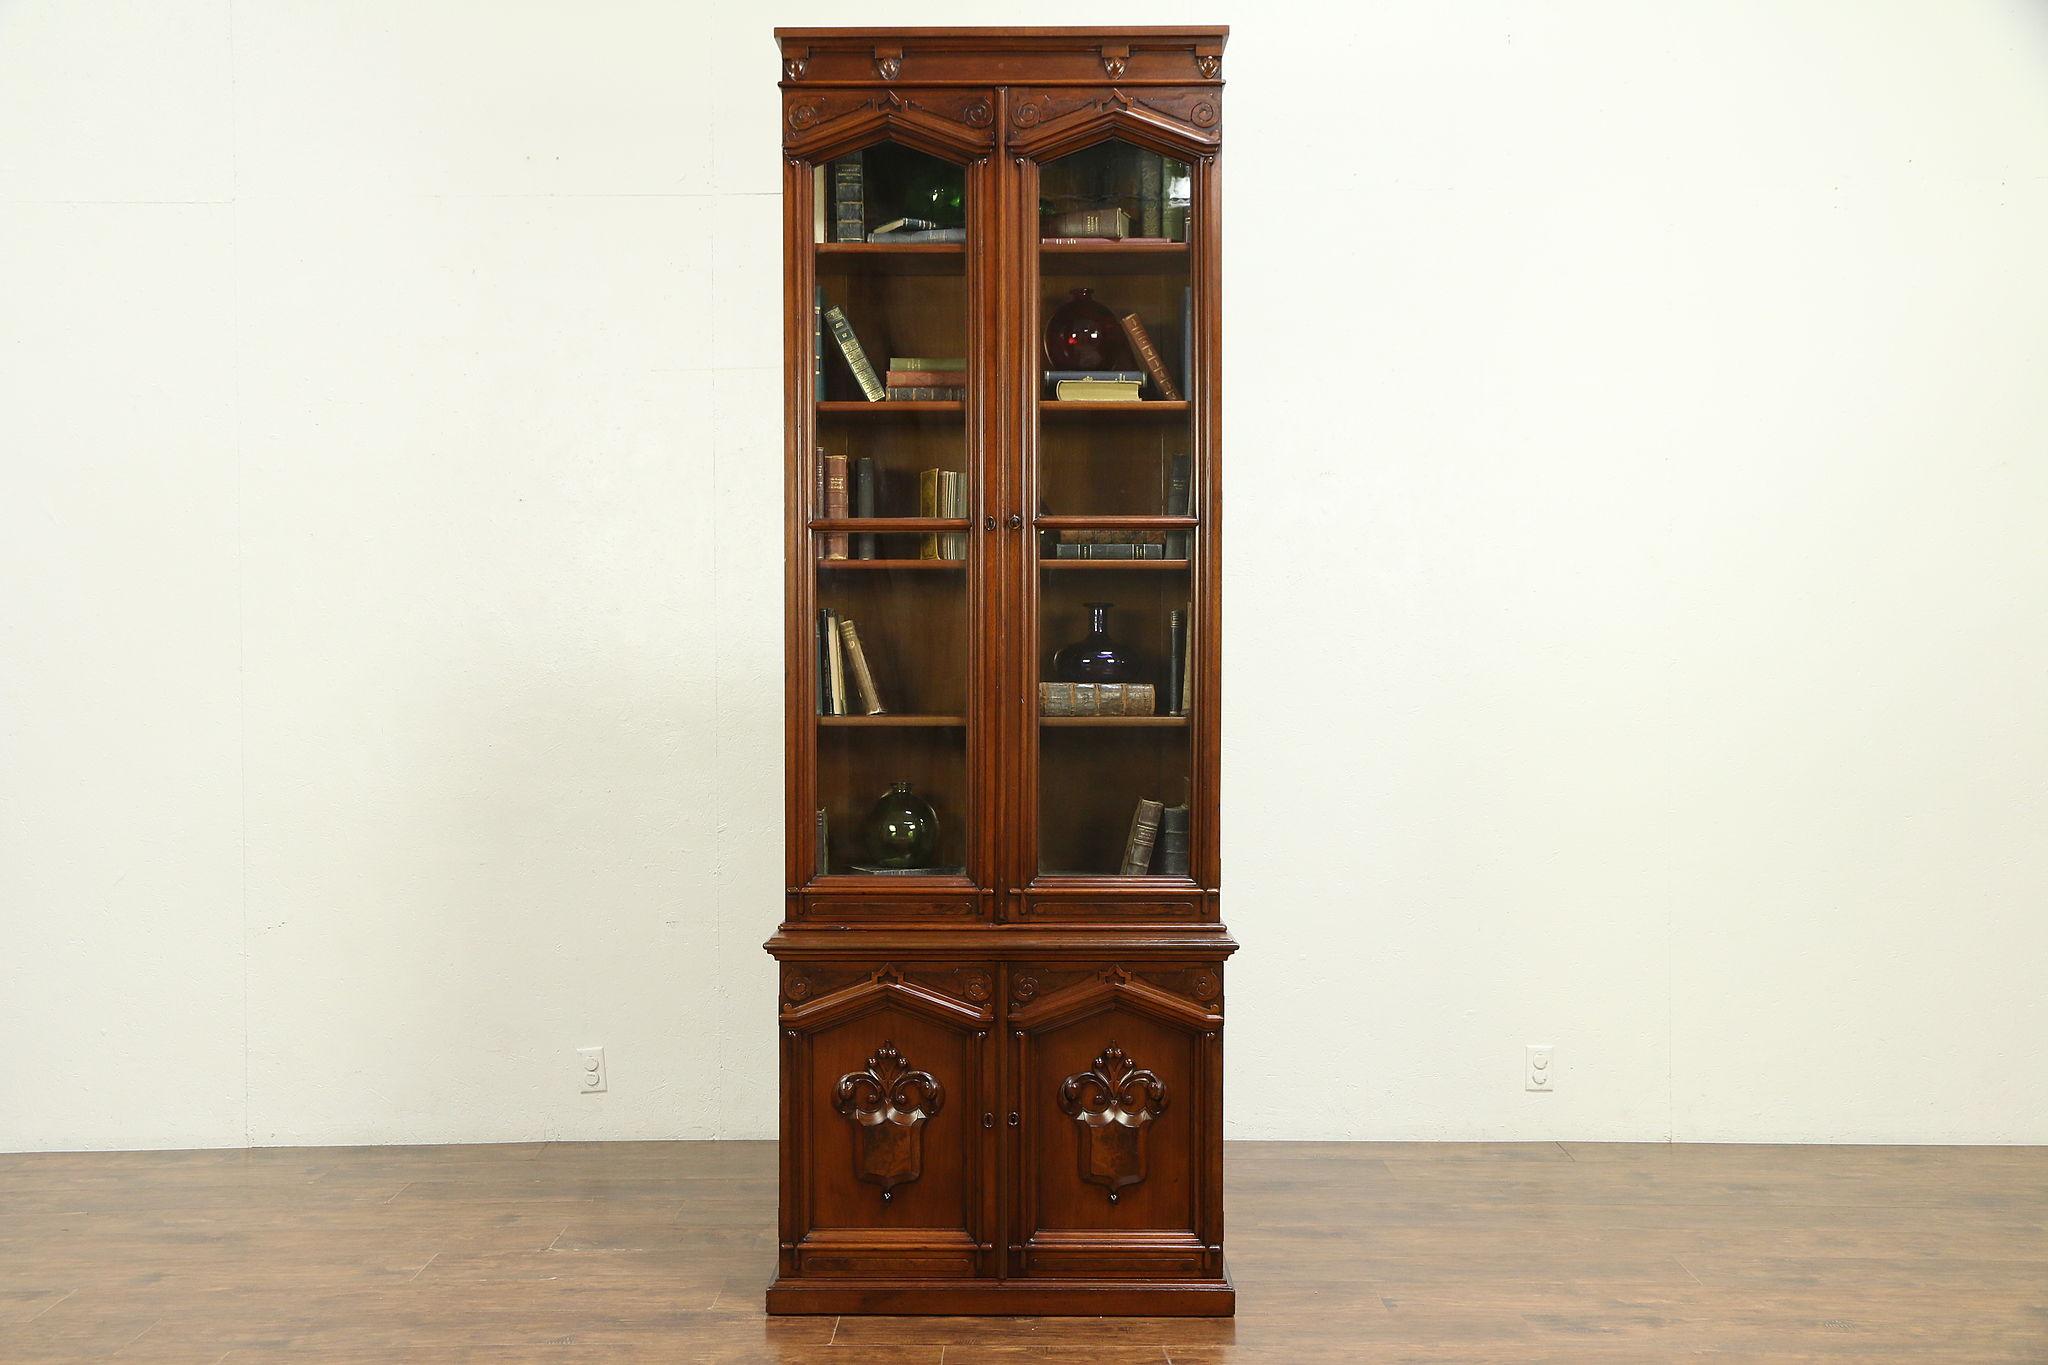 Victorian Antique 1870 Walnut Burl Tall Bookcase Wavy Glass Doors 30304